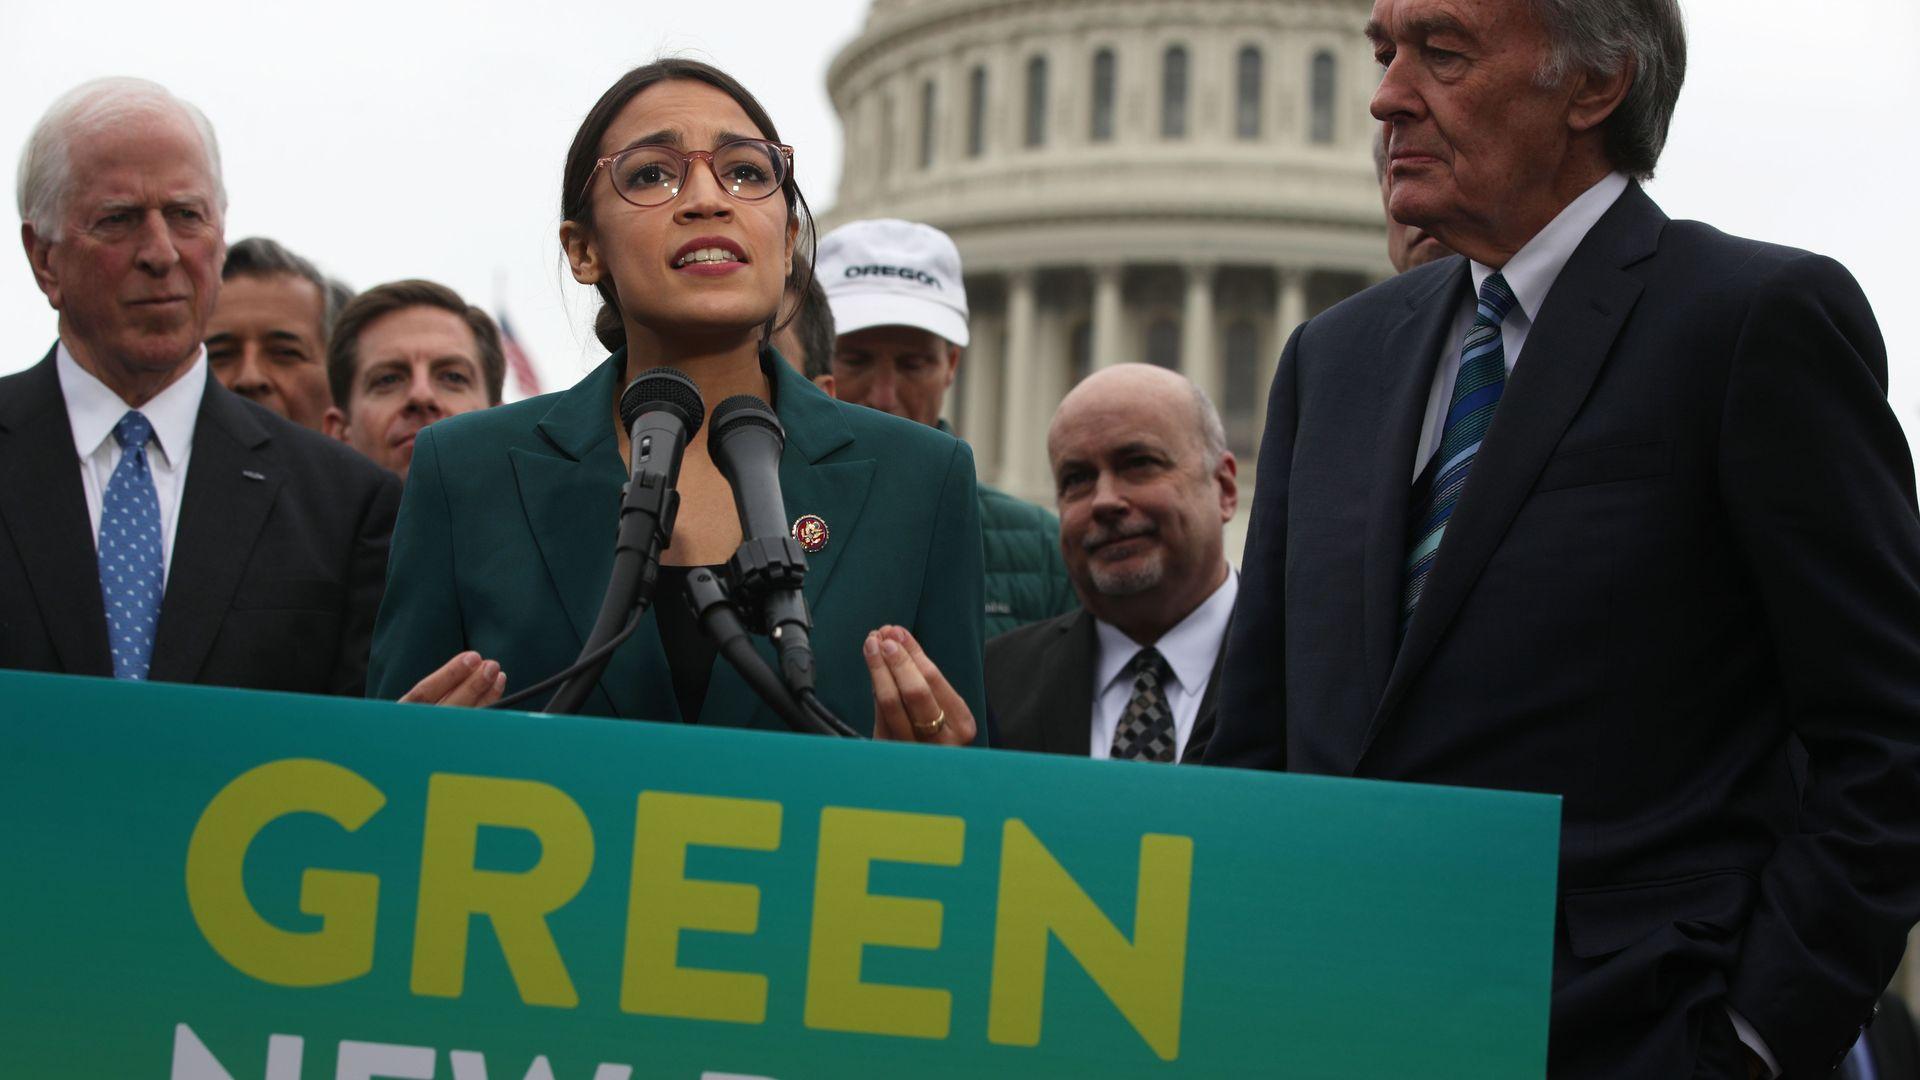 Rep. Alexandria Ocasio-Cortez and Sen. Ed Markey unveiled the Green New Deal